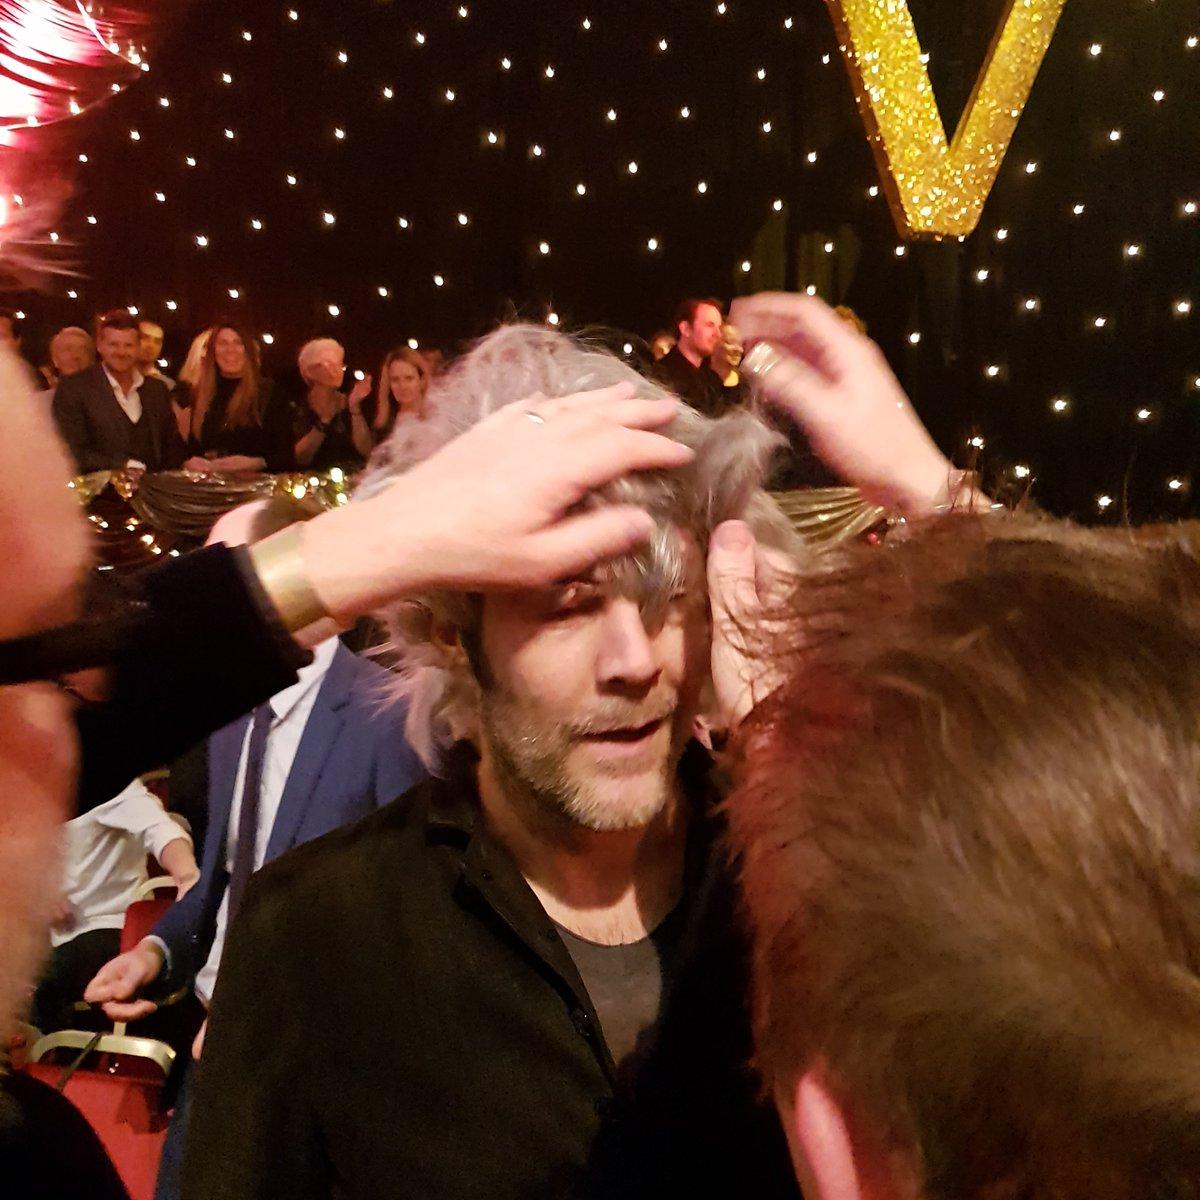 @rhodgilbertshow #hootenanny #wig #nye https://t.co/RU2fBGmIL3